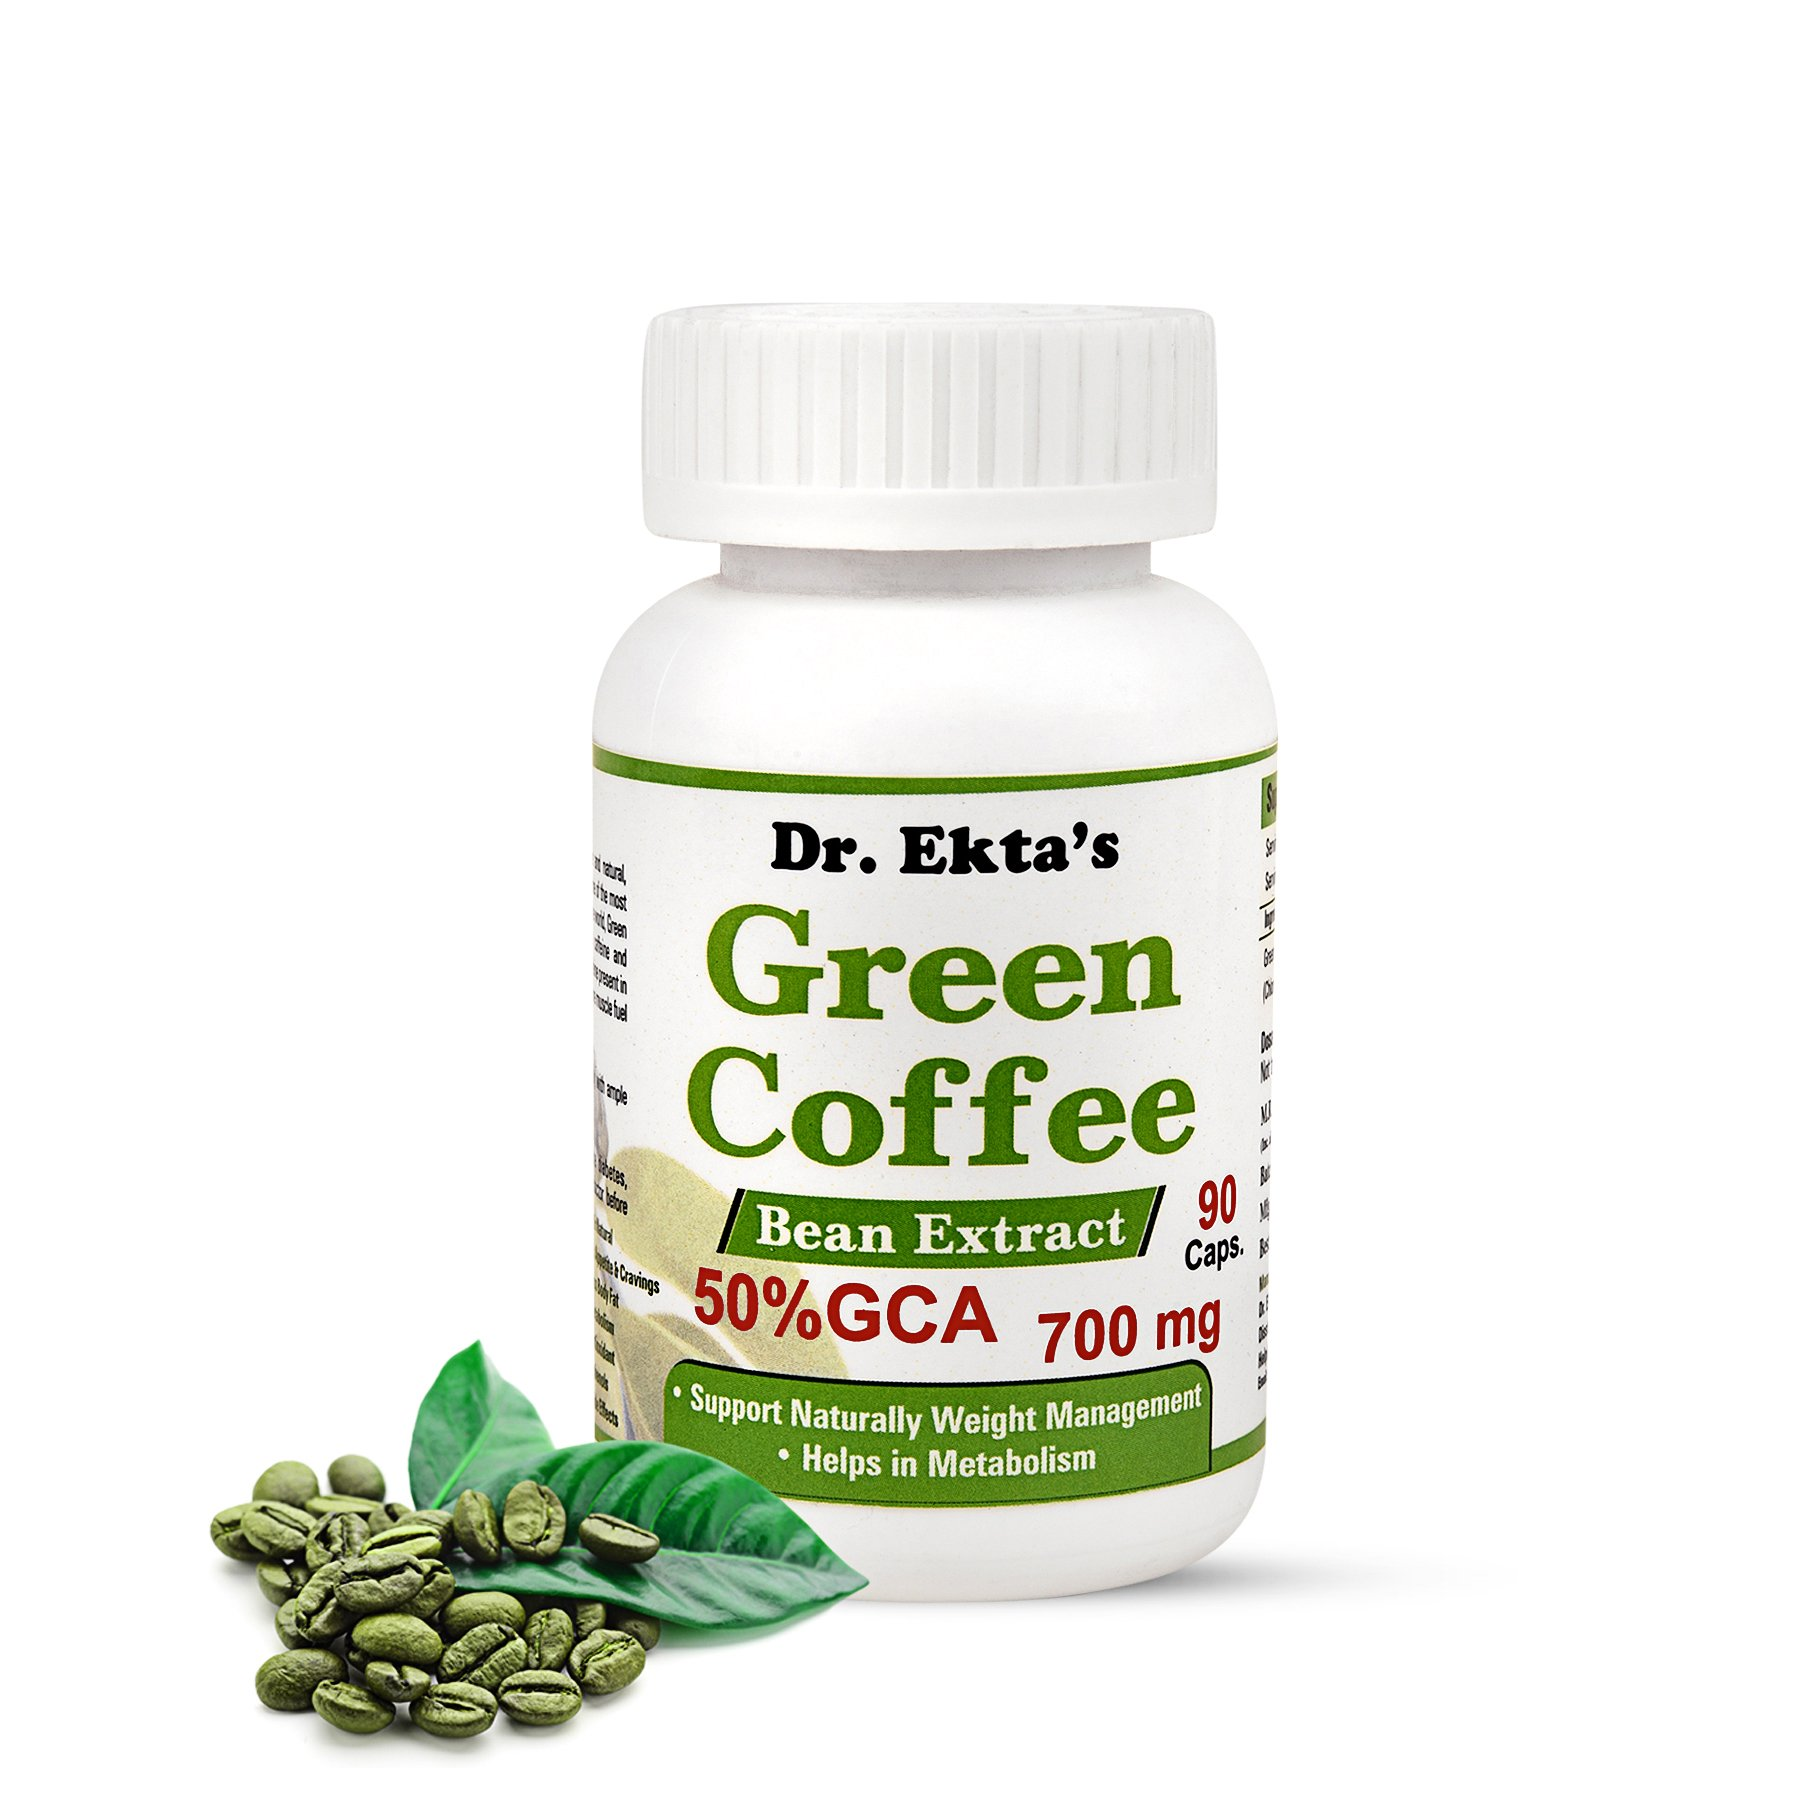 Dr Ekta S Green Coffee Bean Extract 700 Mg 50 Gca 90 Capsules